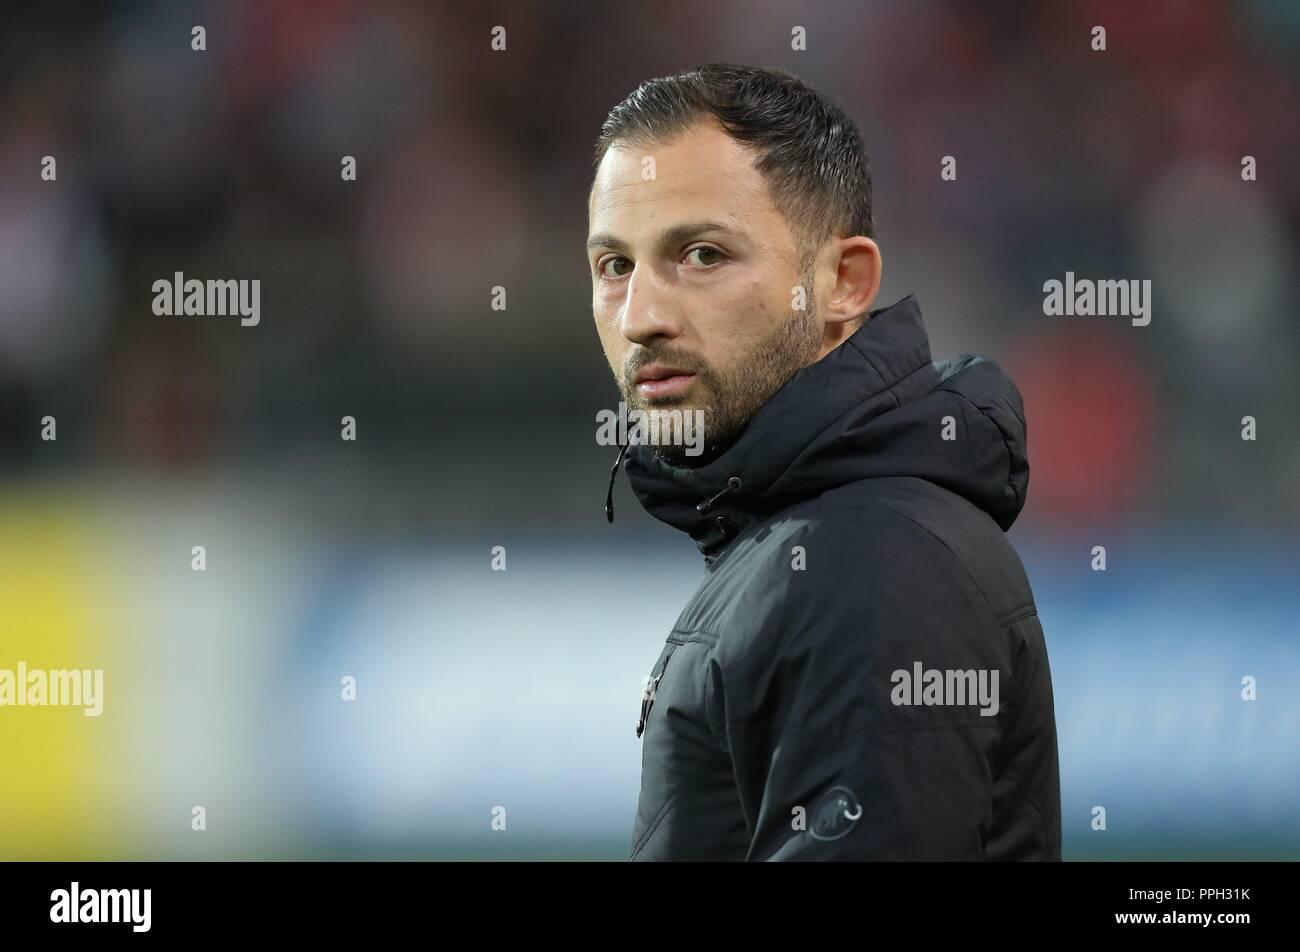 firo: 25.09.2018 Football, Football: 1. Bundesliga, Season 2018/2019 SC Freiburg - S04 FC Schalke 04 S04 Coach, Domenico Tedesco, Portrait, Headshot,   usage worldwide - Stock Image